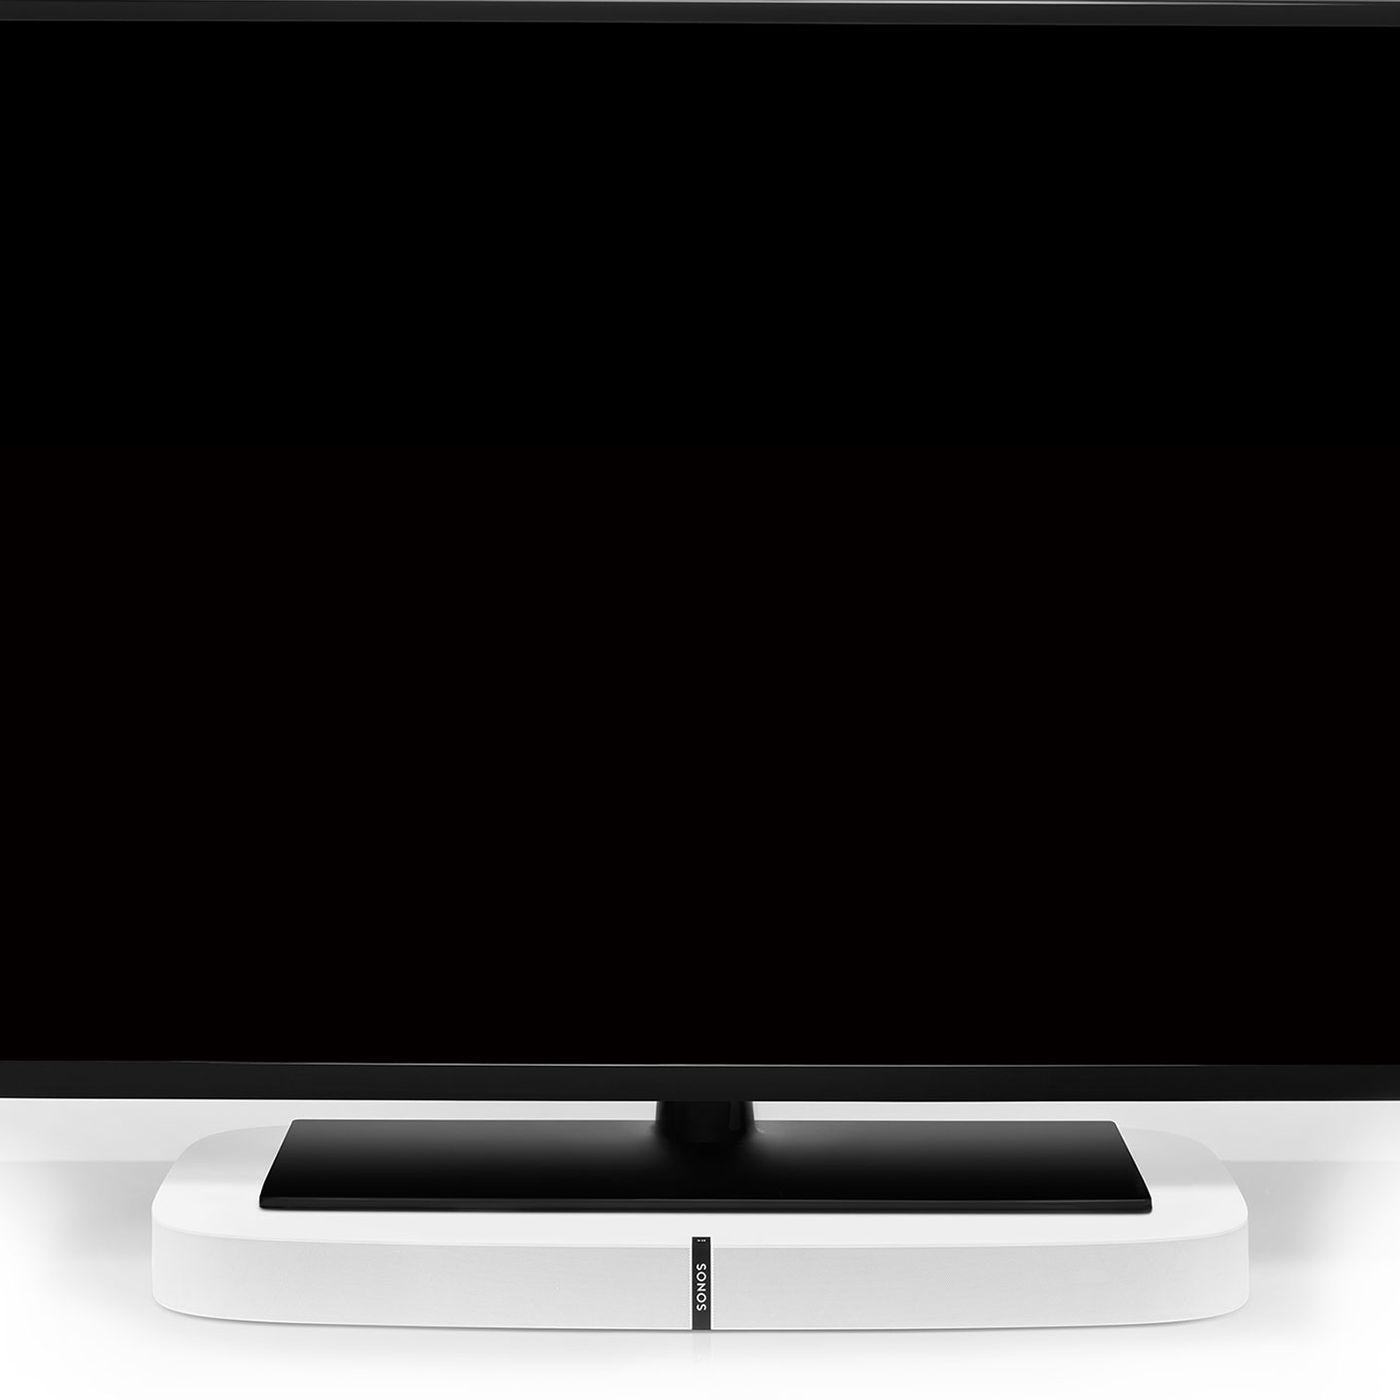 Mossberg: Sonos solves TV audio problems, for a stiff price - Vox